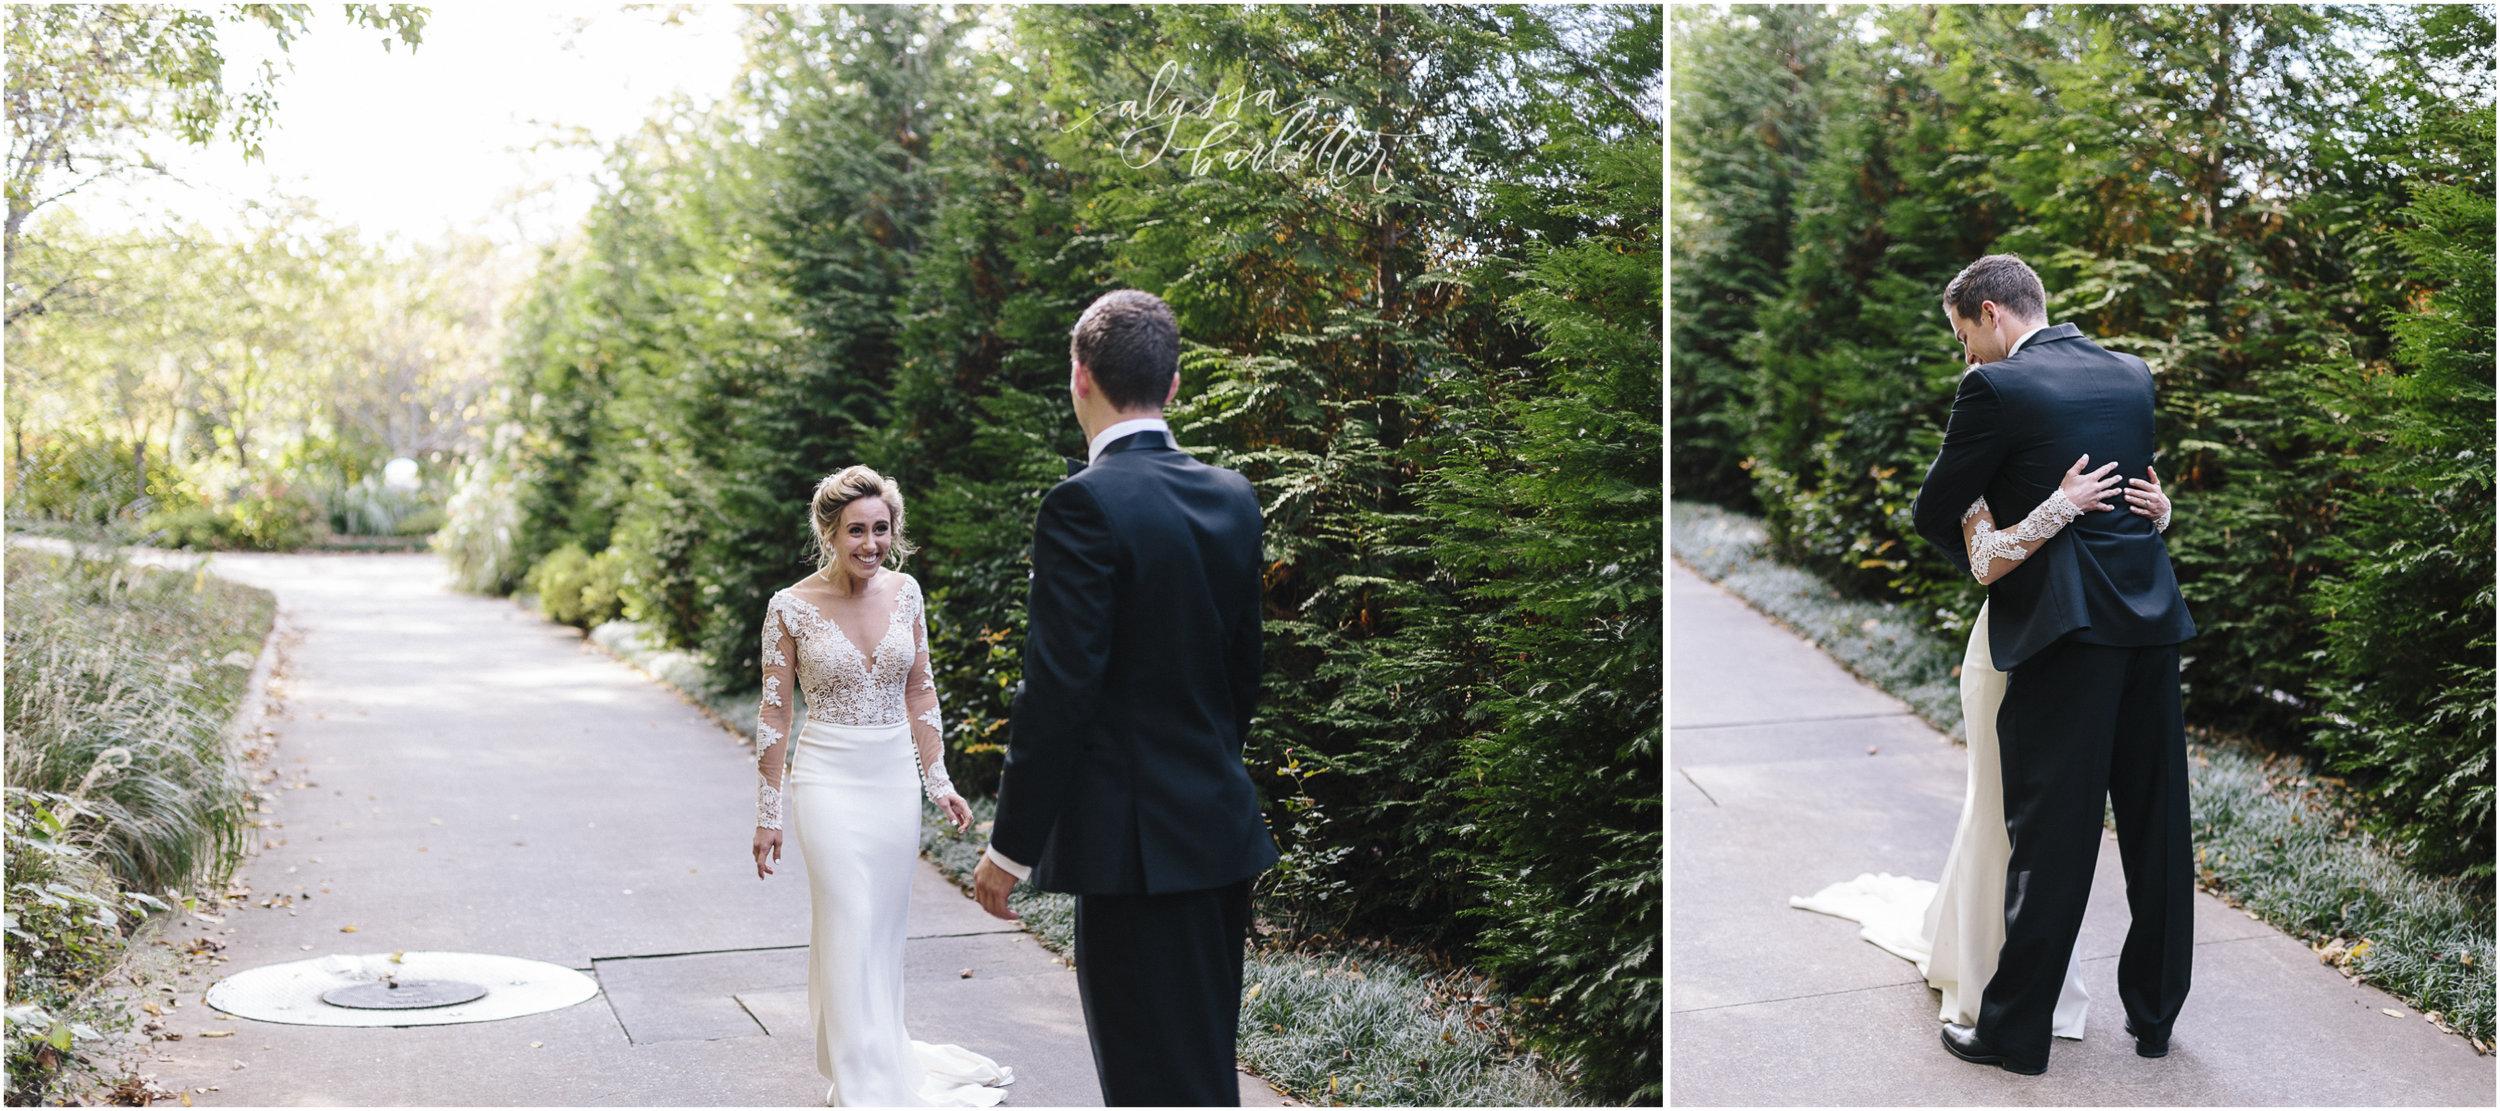 alyssa barletter photography fayetteville arkansas wedding photos micah and colin-1-19.jpg